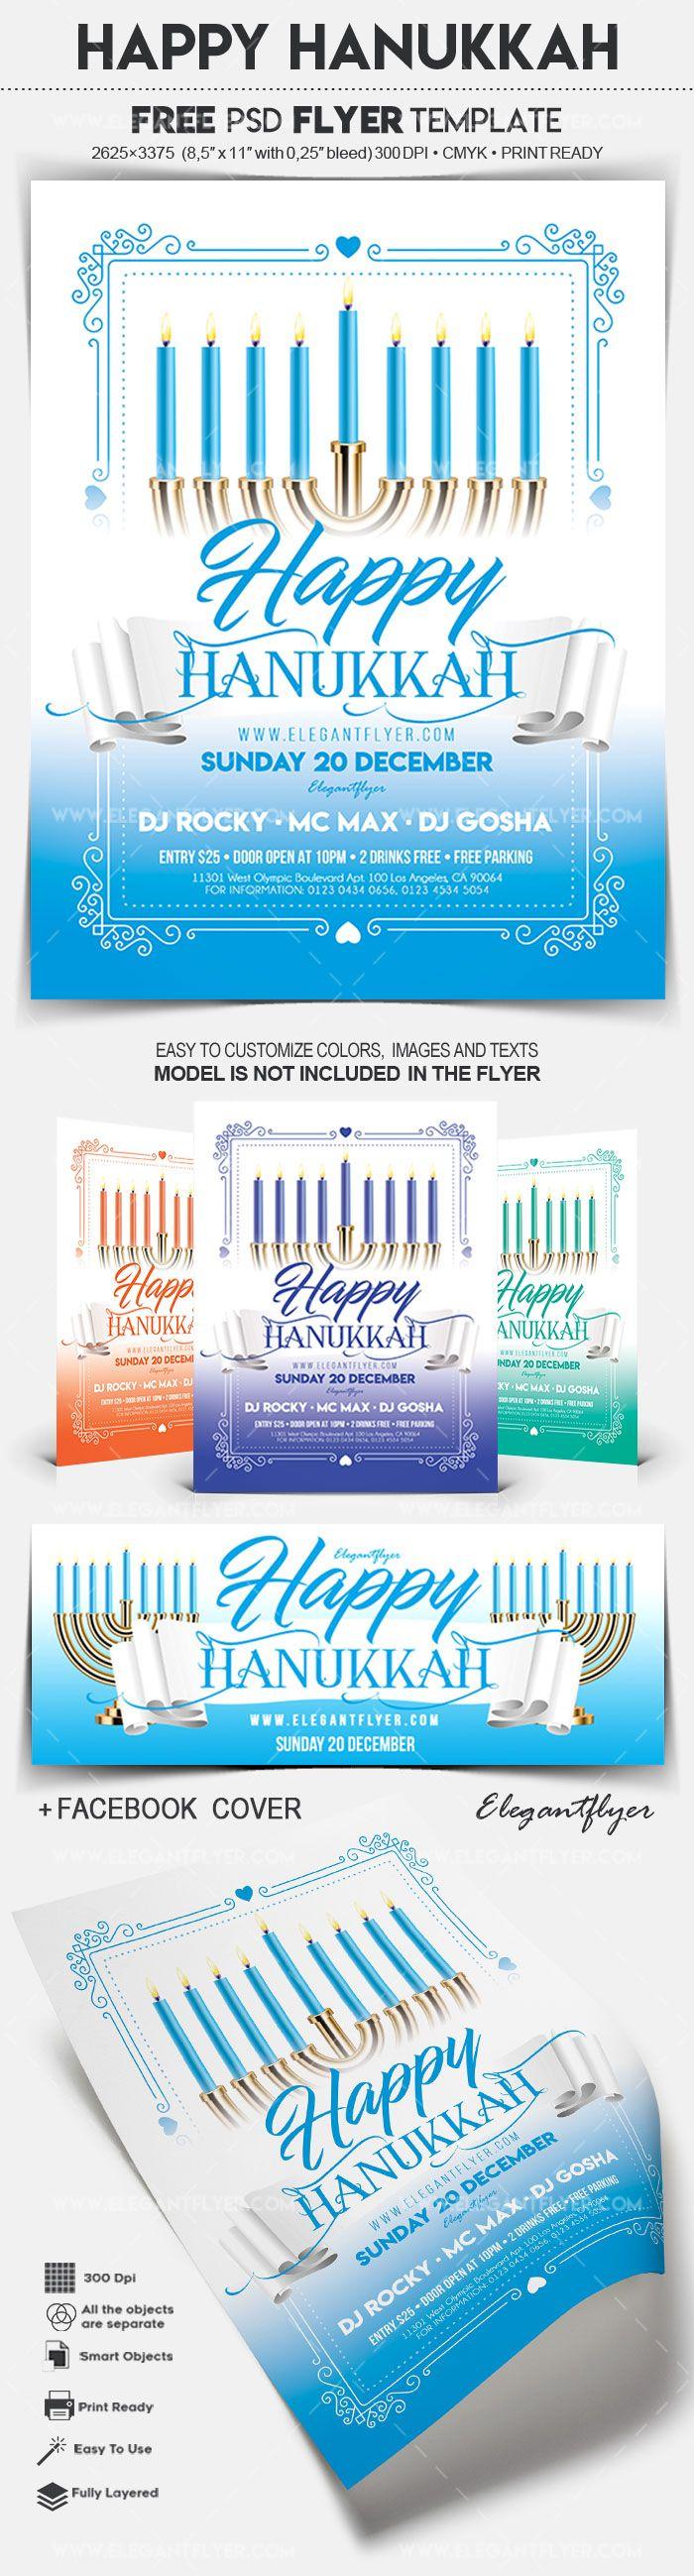 https://www.elegantflyer.com/free-flyers/happy-hanukkah-free-flyer-psd-template-facebook-cover/